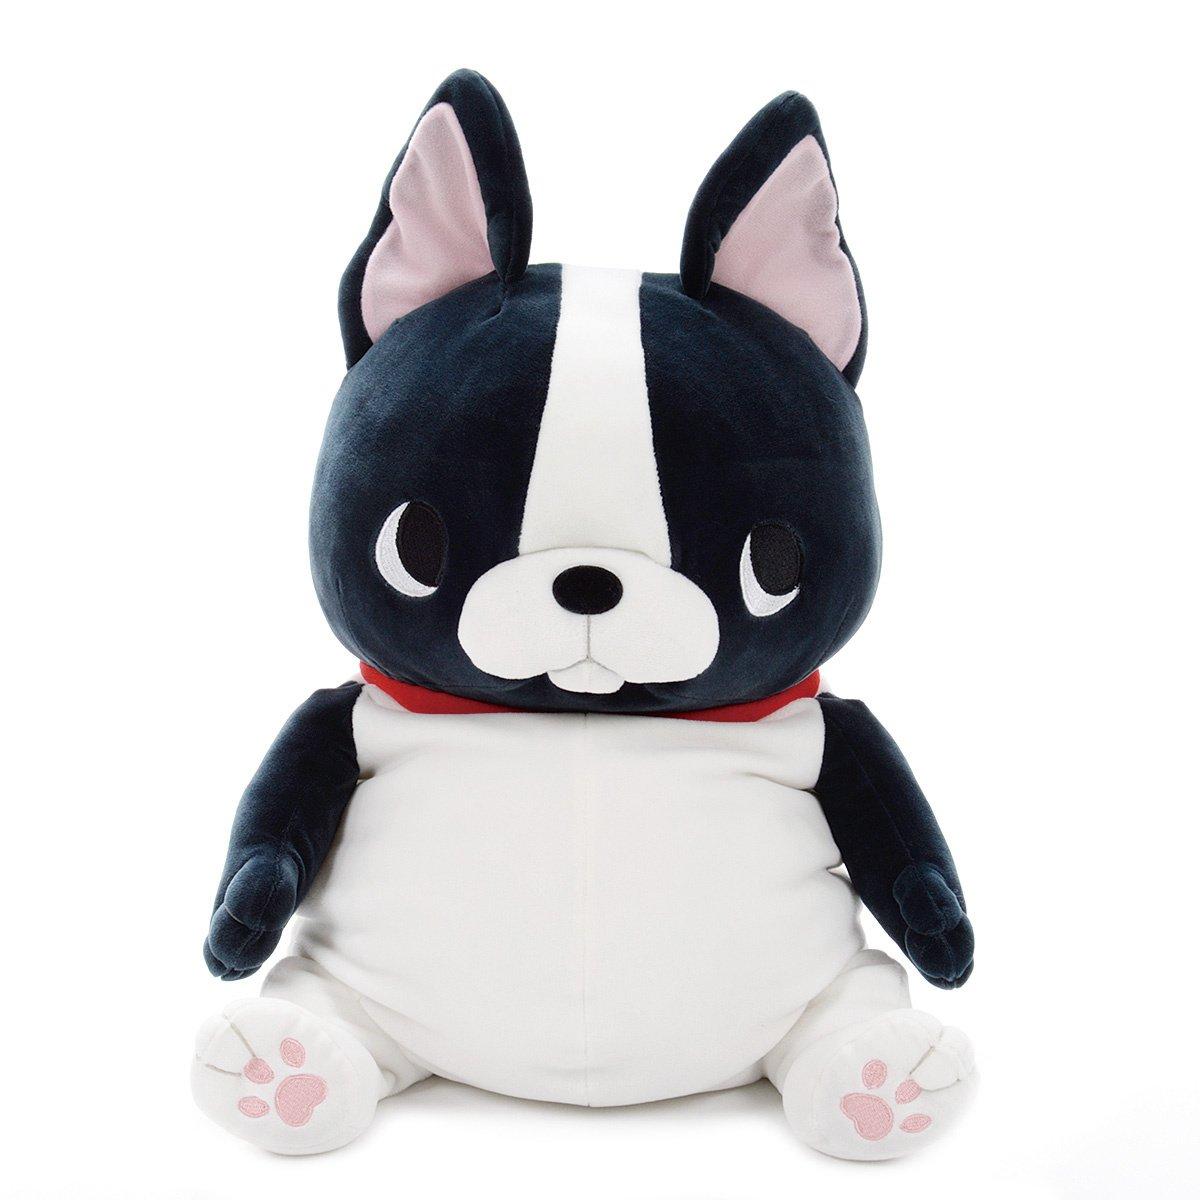 Plush Pug Amuse Buruburu Boo Boo Black White 16 Inches